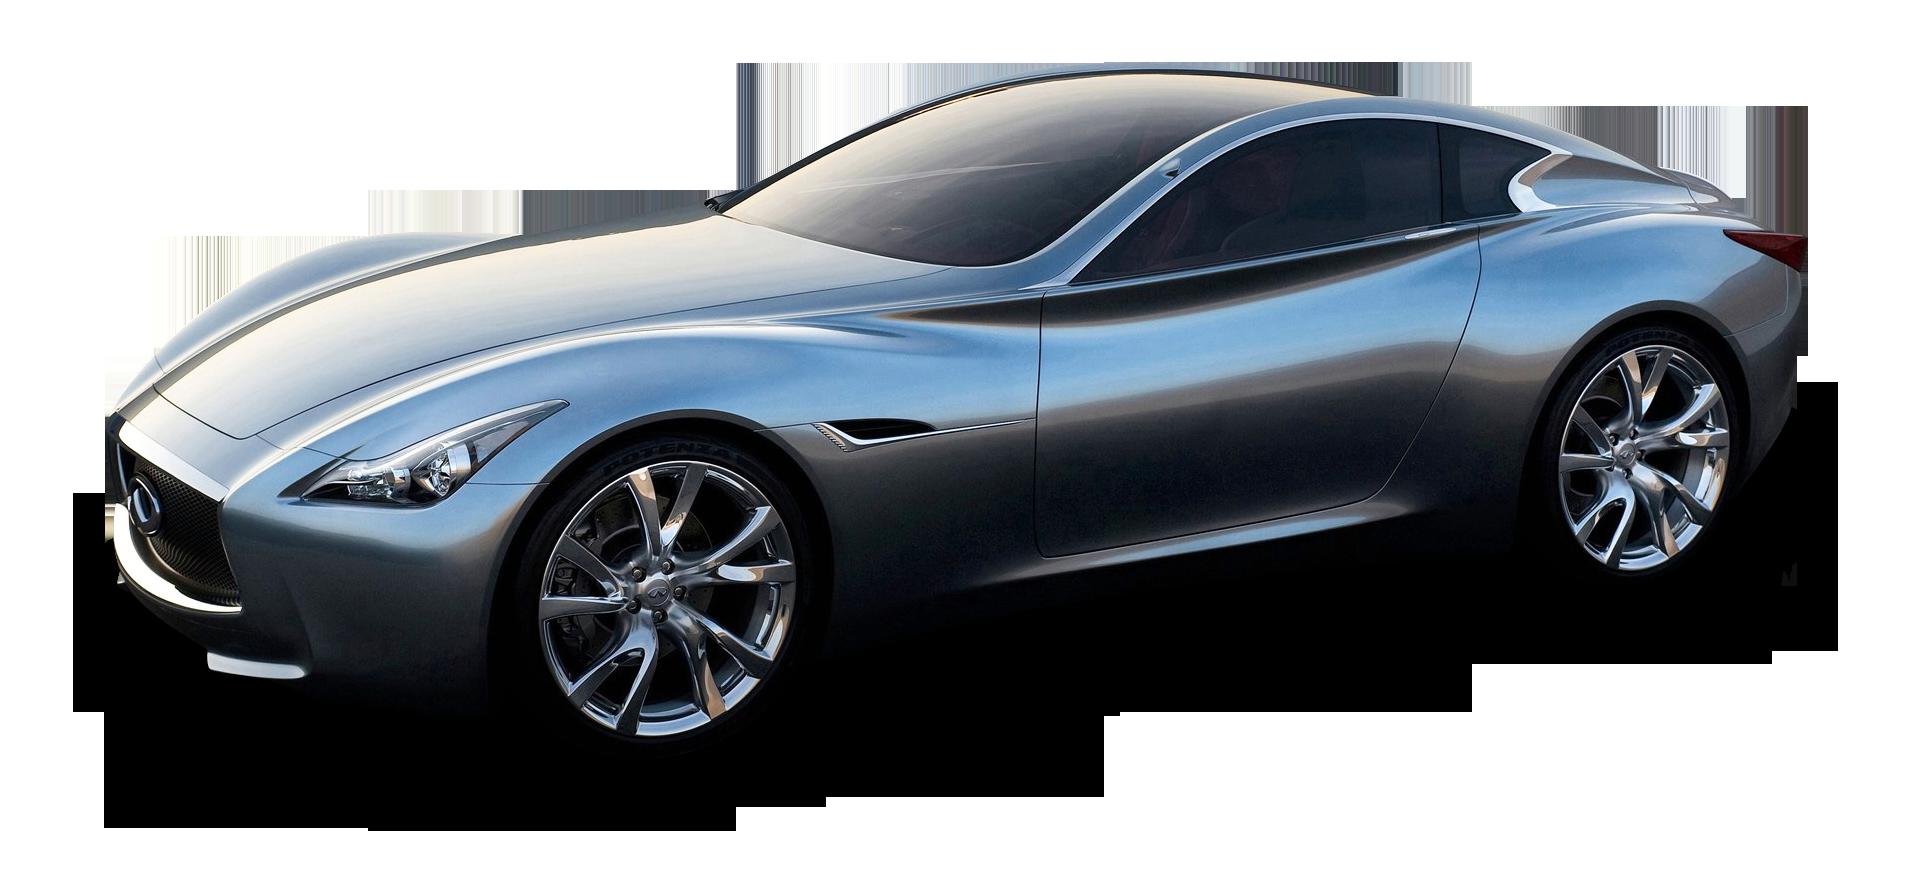 Infiniti Essence Concept Sports Car